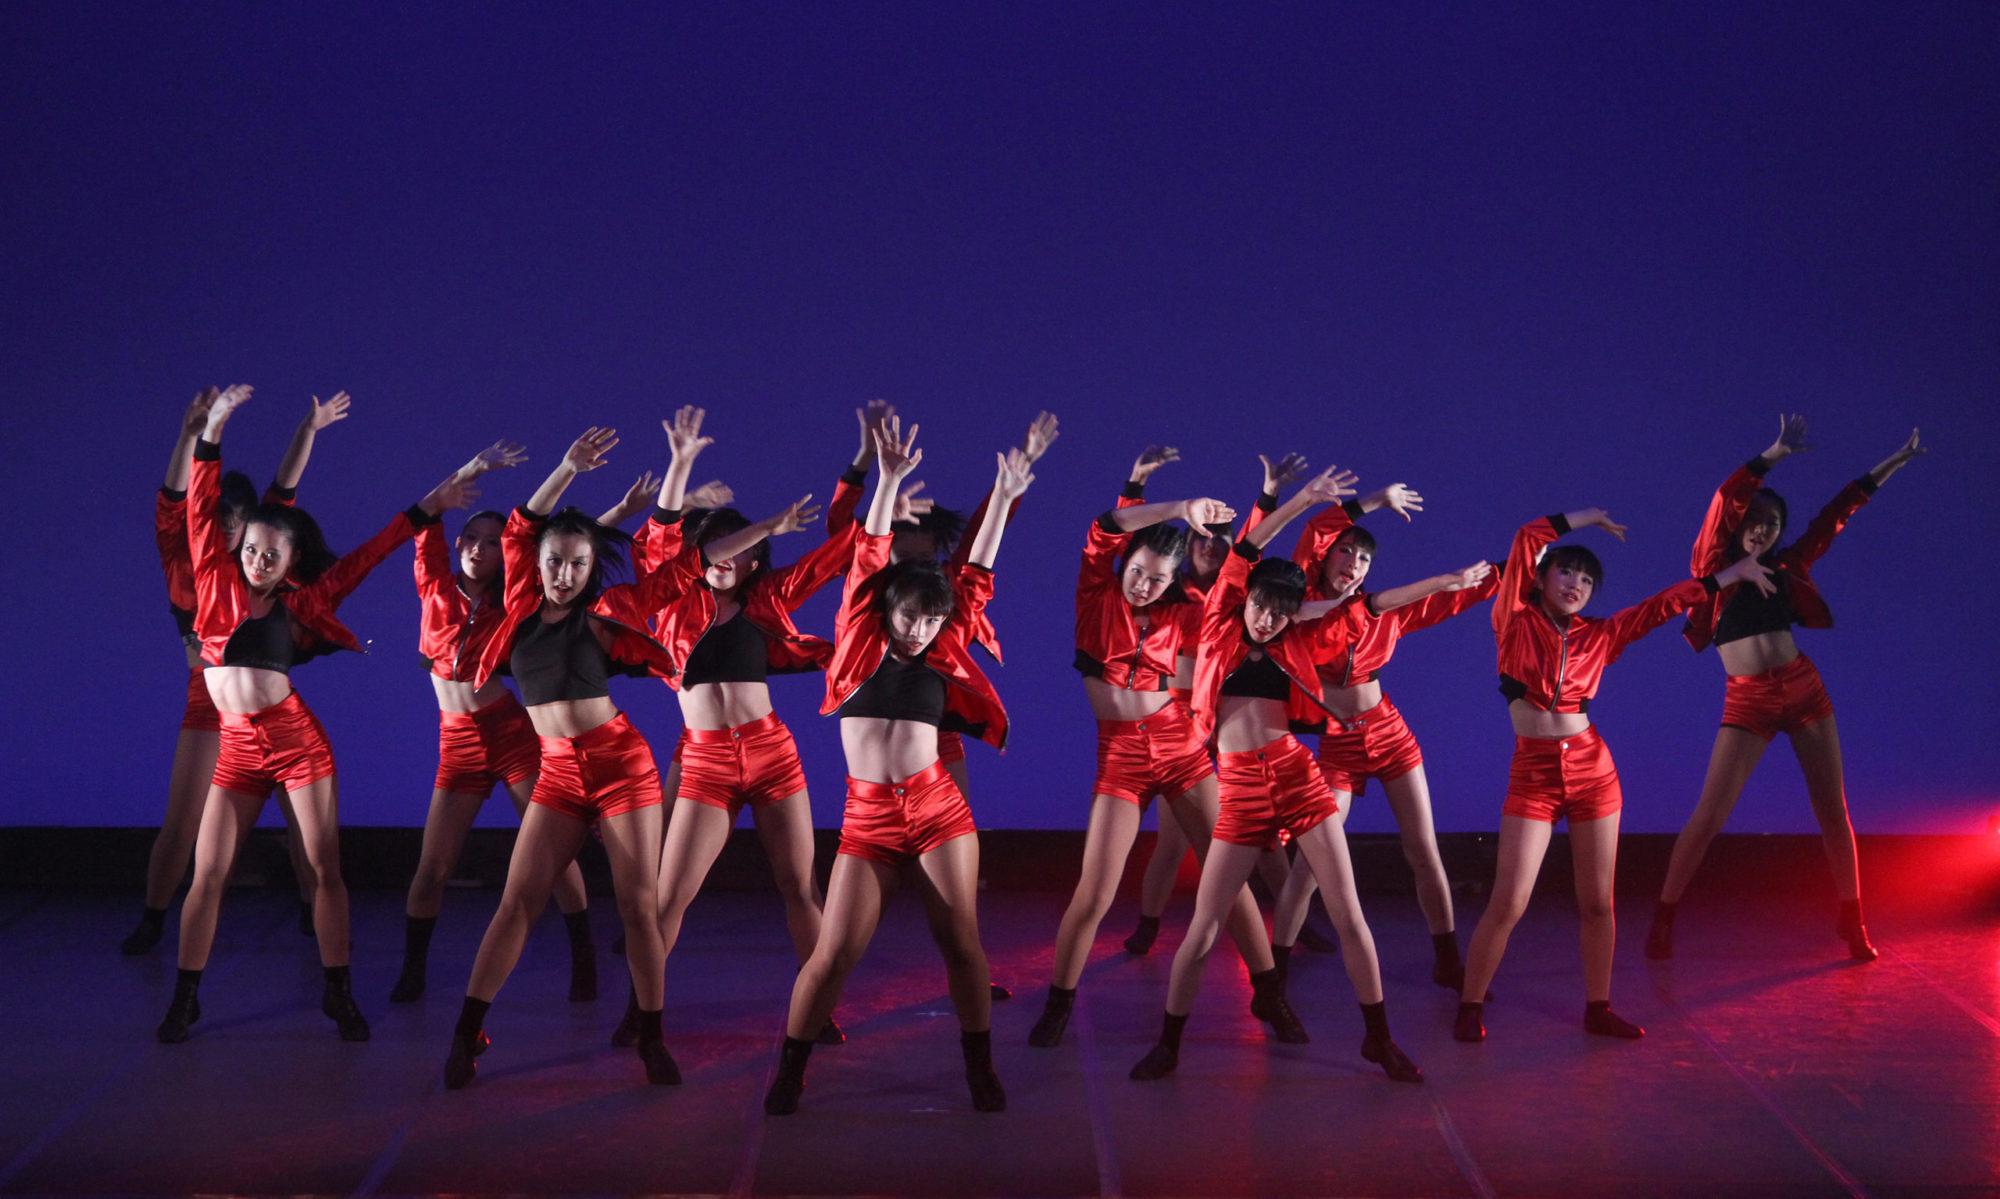 MAYUMI JAZZ BALLET DANCE STUDIO